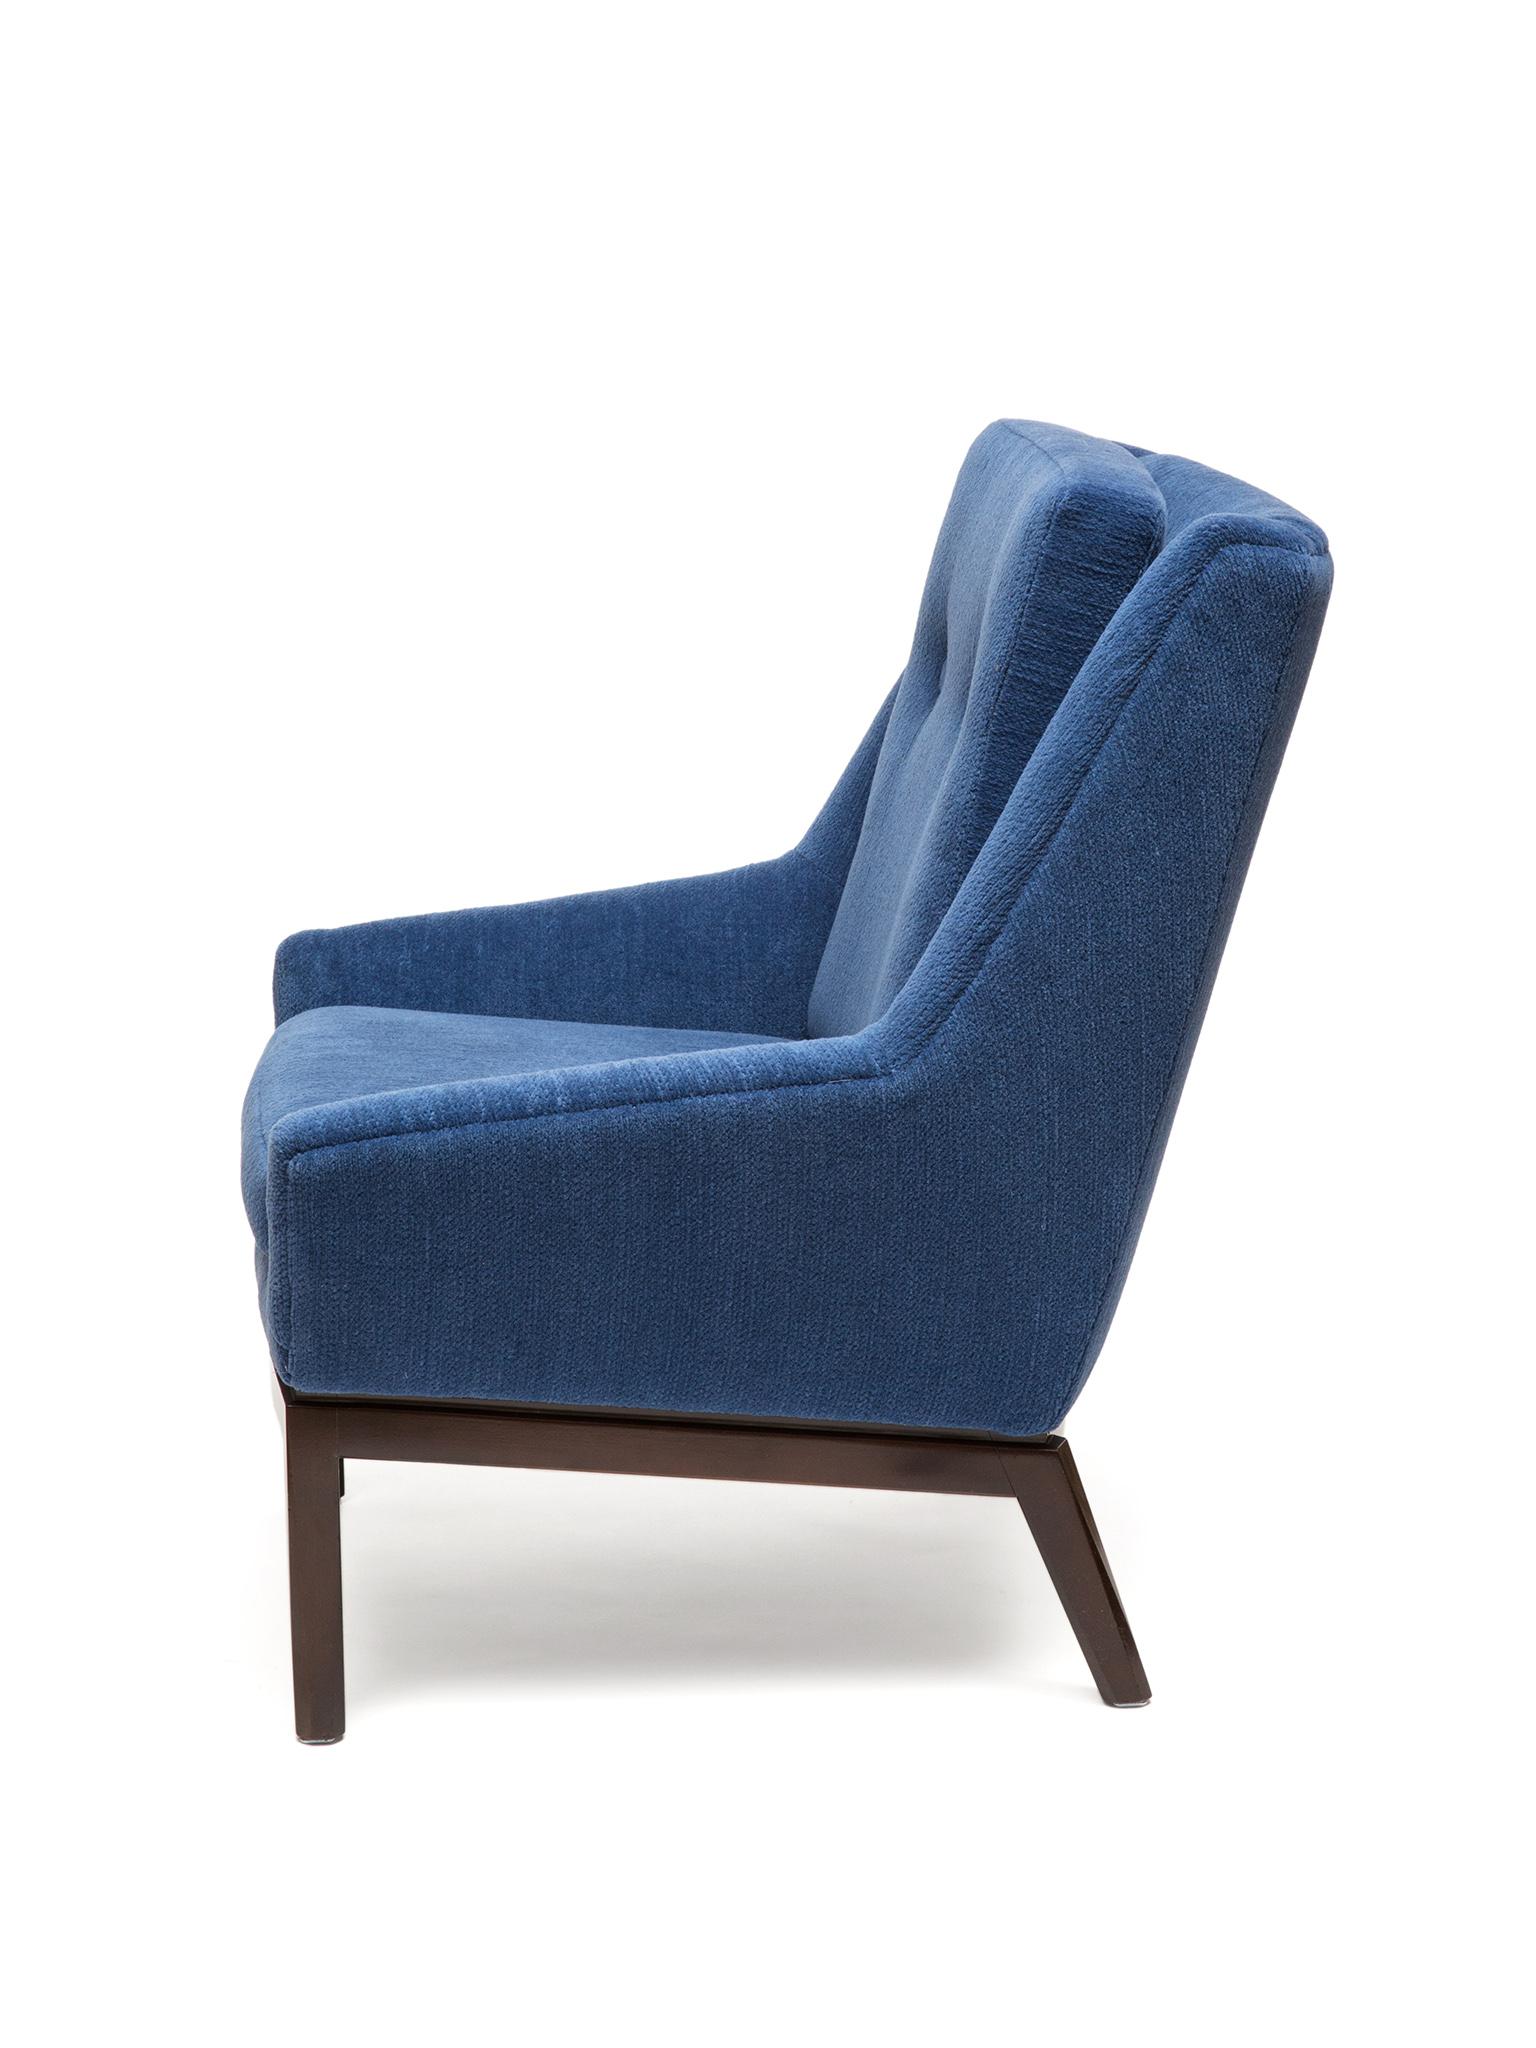 Markham Chairs VINTAGE0067